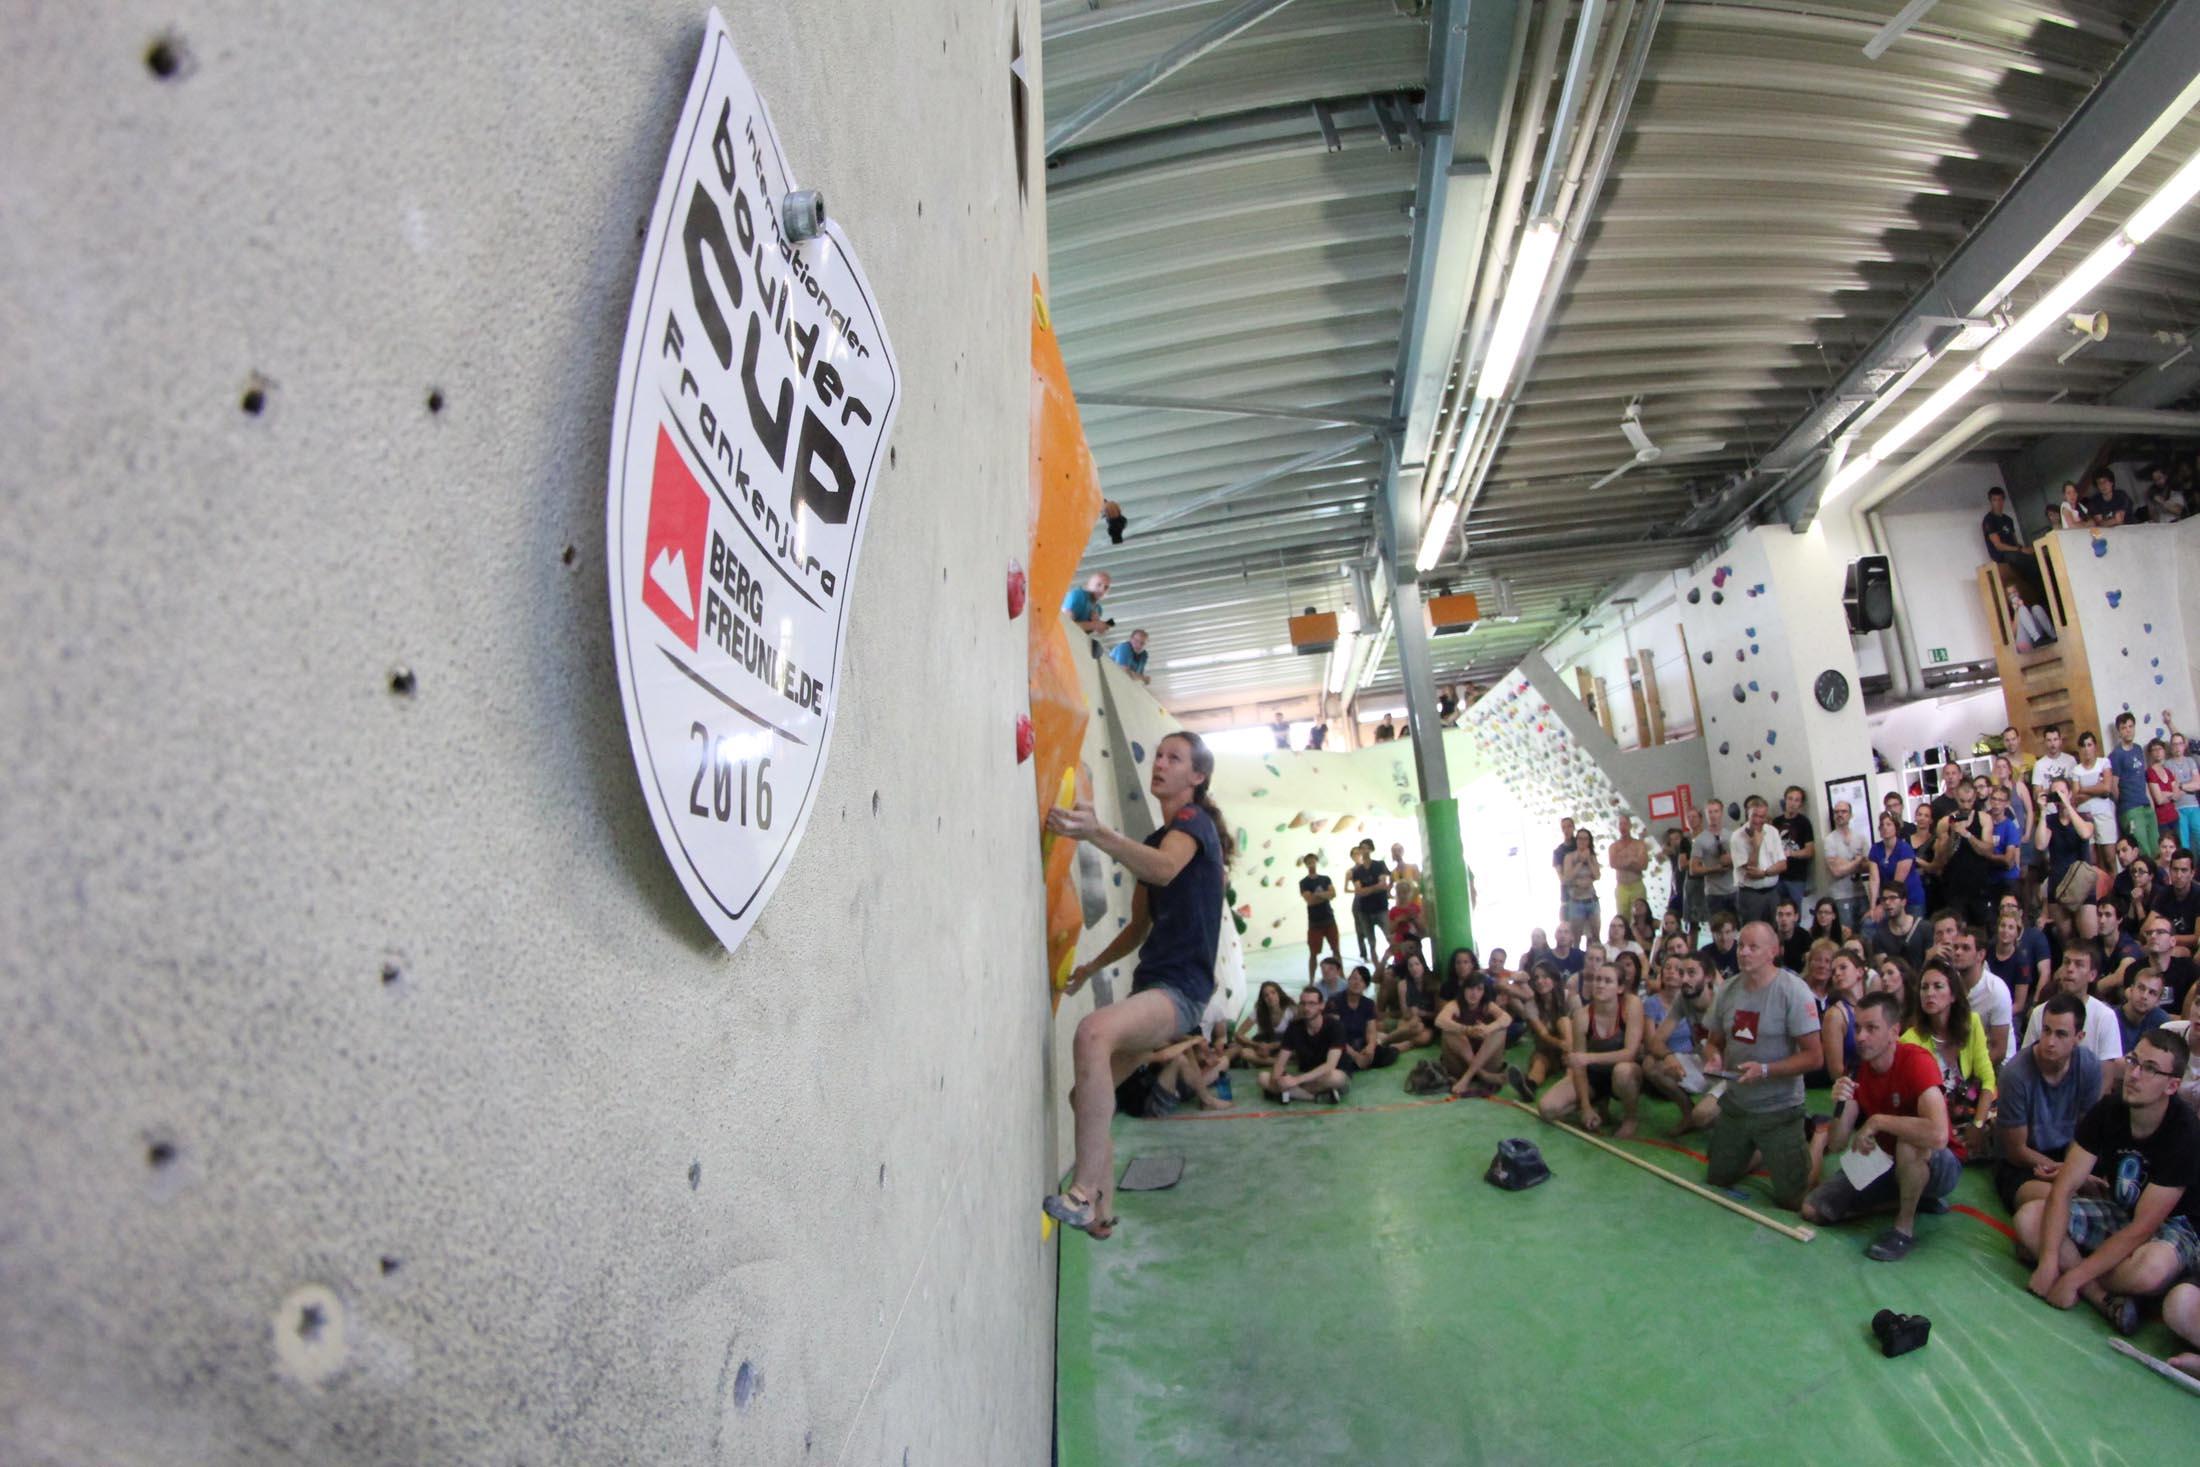 Finale, internationaler bouldercup Frankenjura 2016, BLOCKHELDEN Erlangen, Mammut, Bergfreunde.de, Boulderwettkampf07092016464